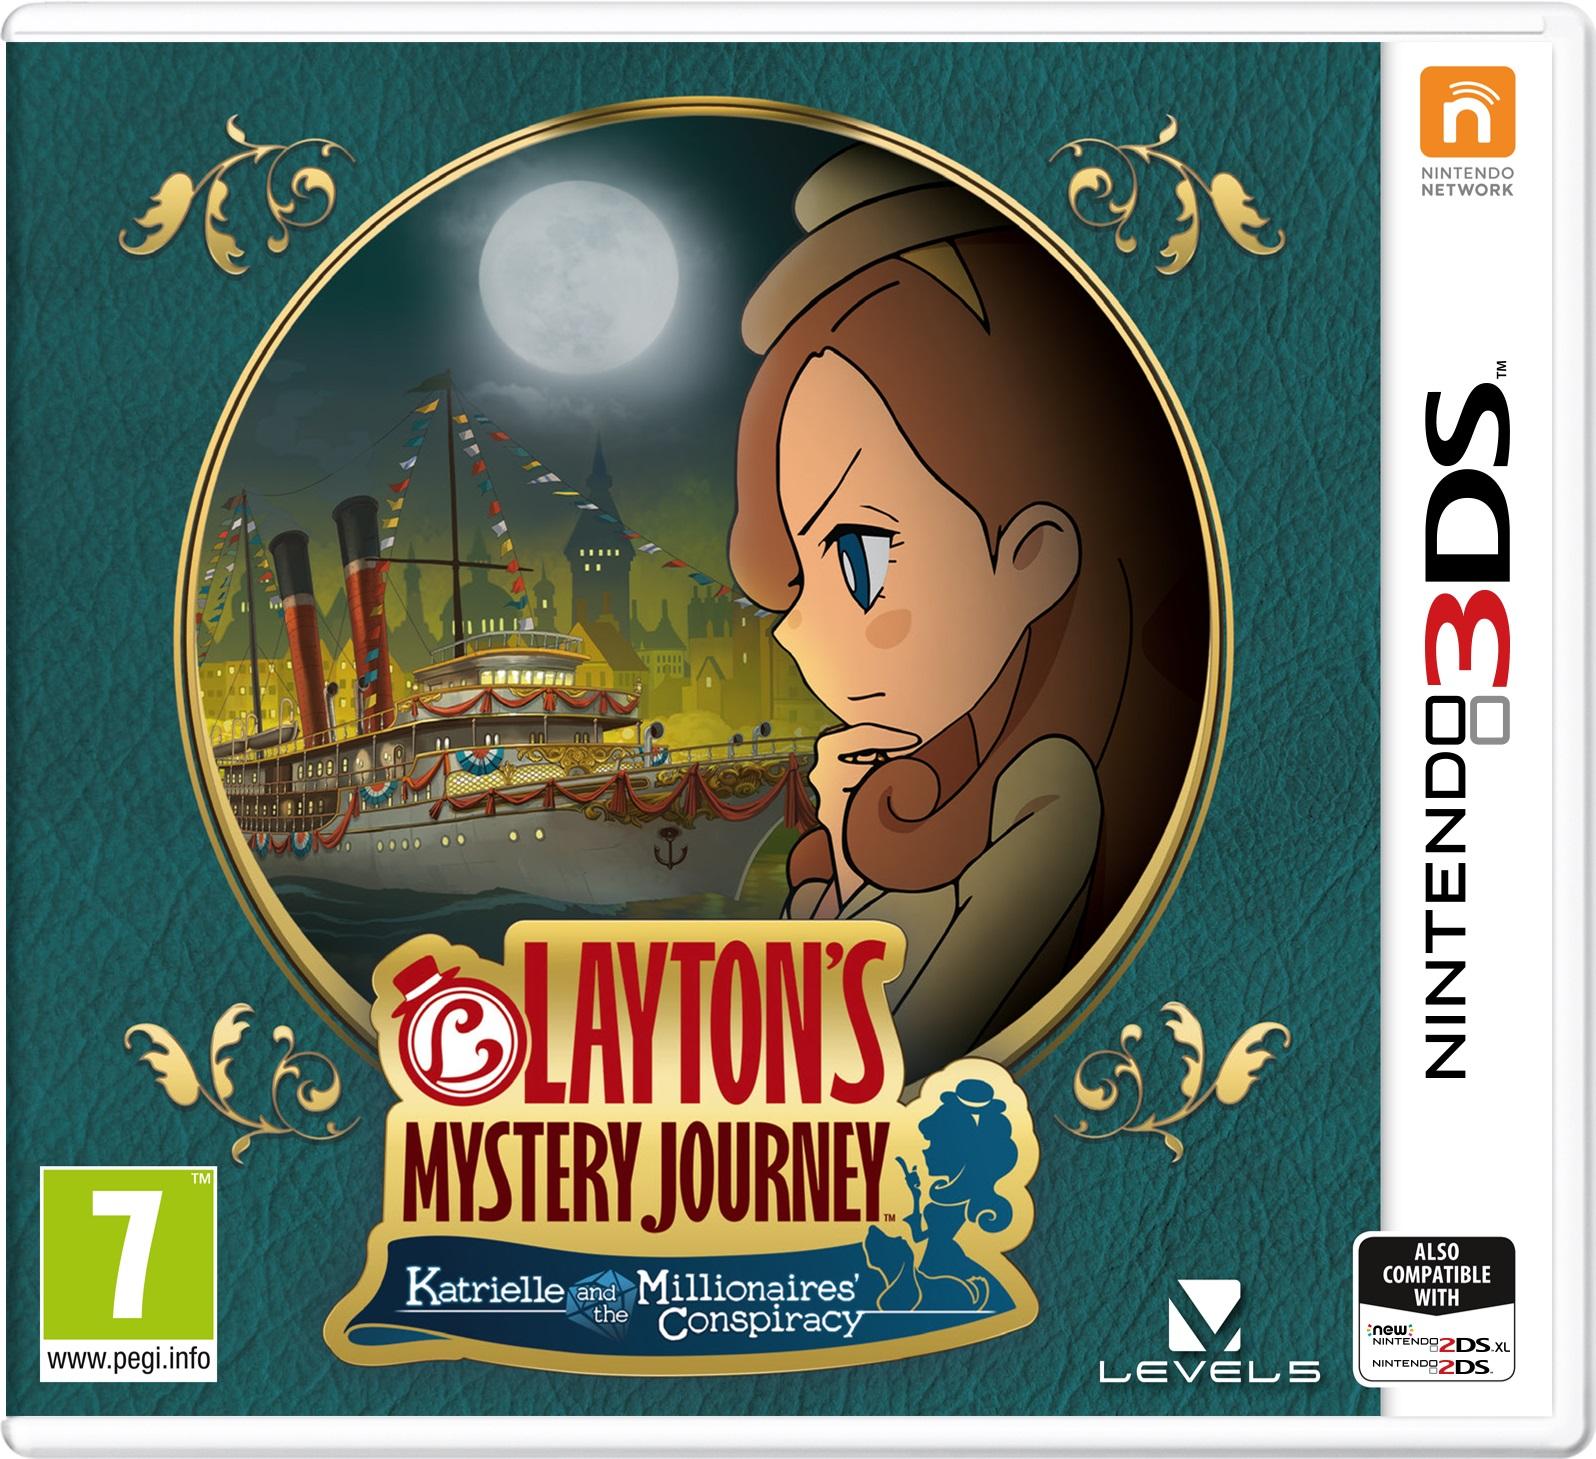 Layton's Mystery Journey Boxart.jpg